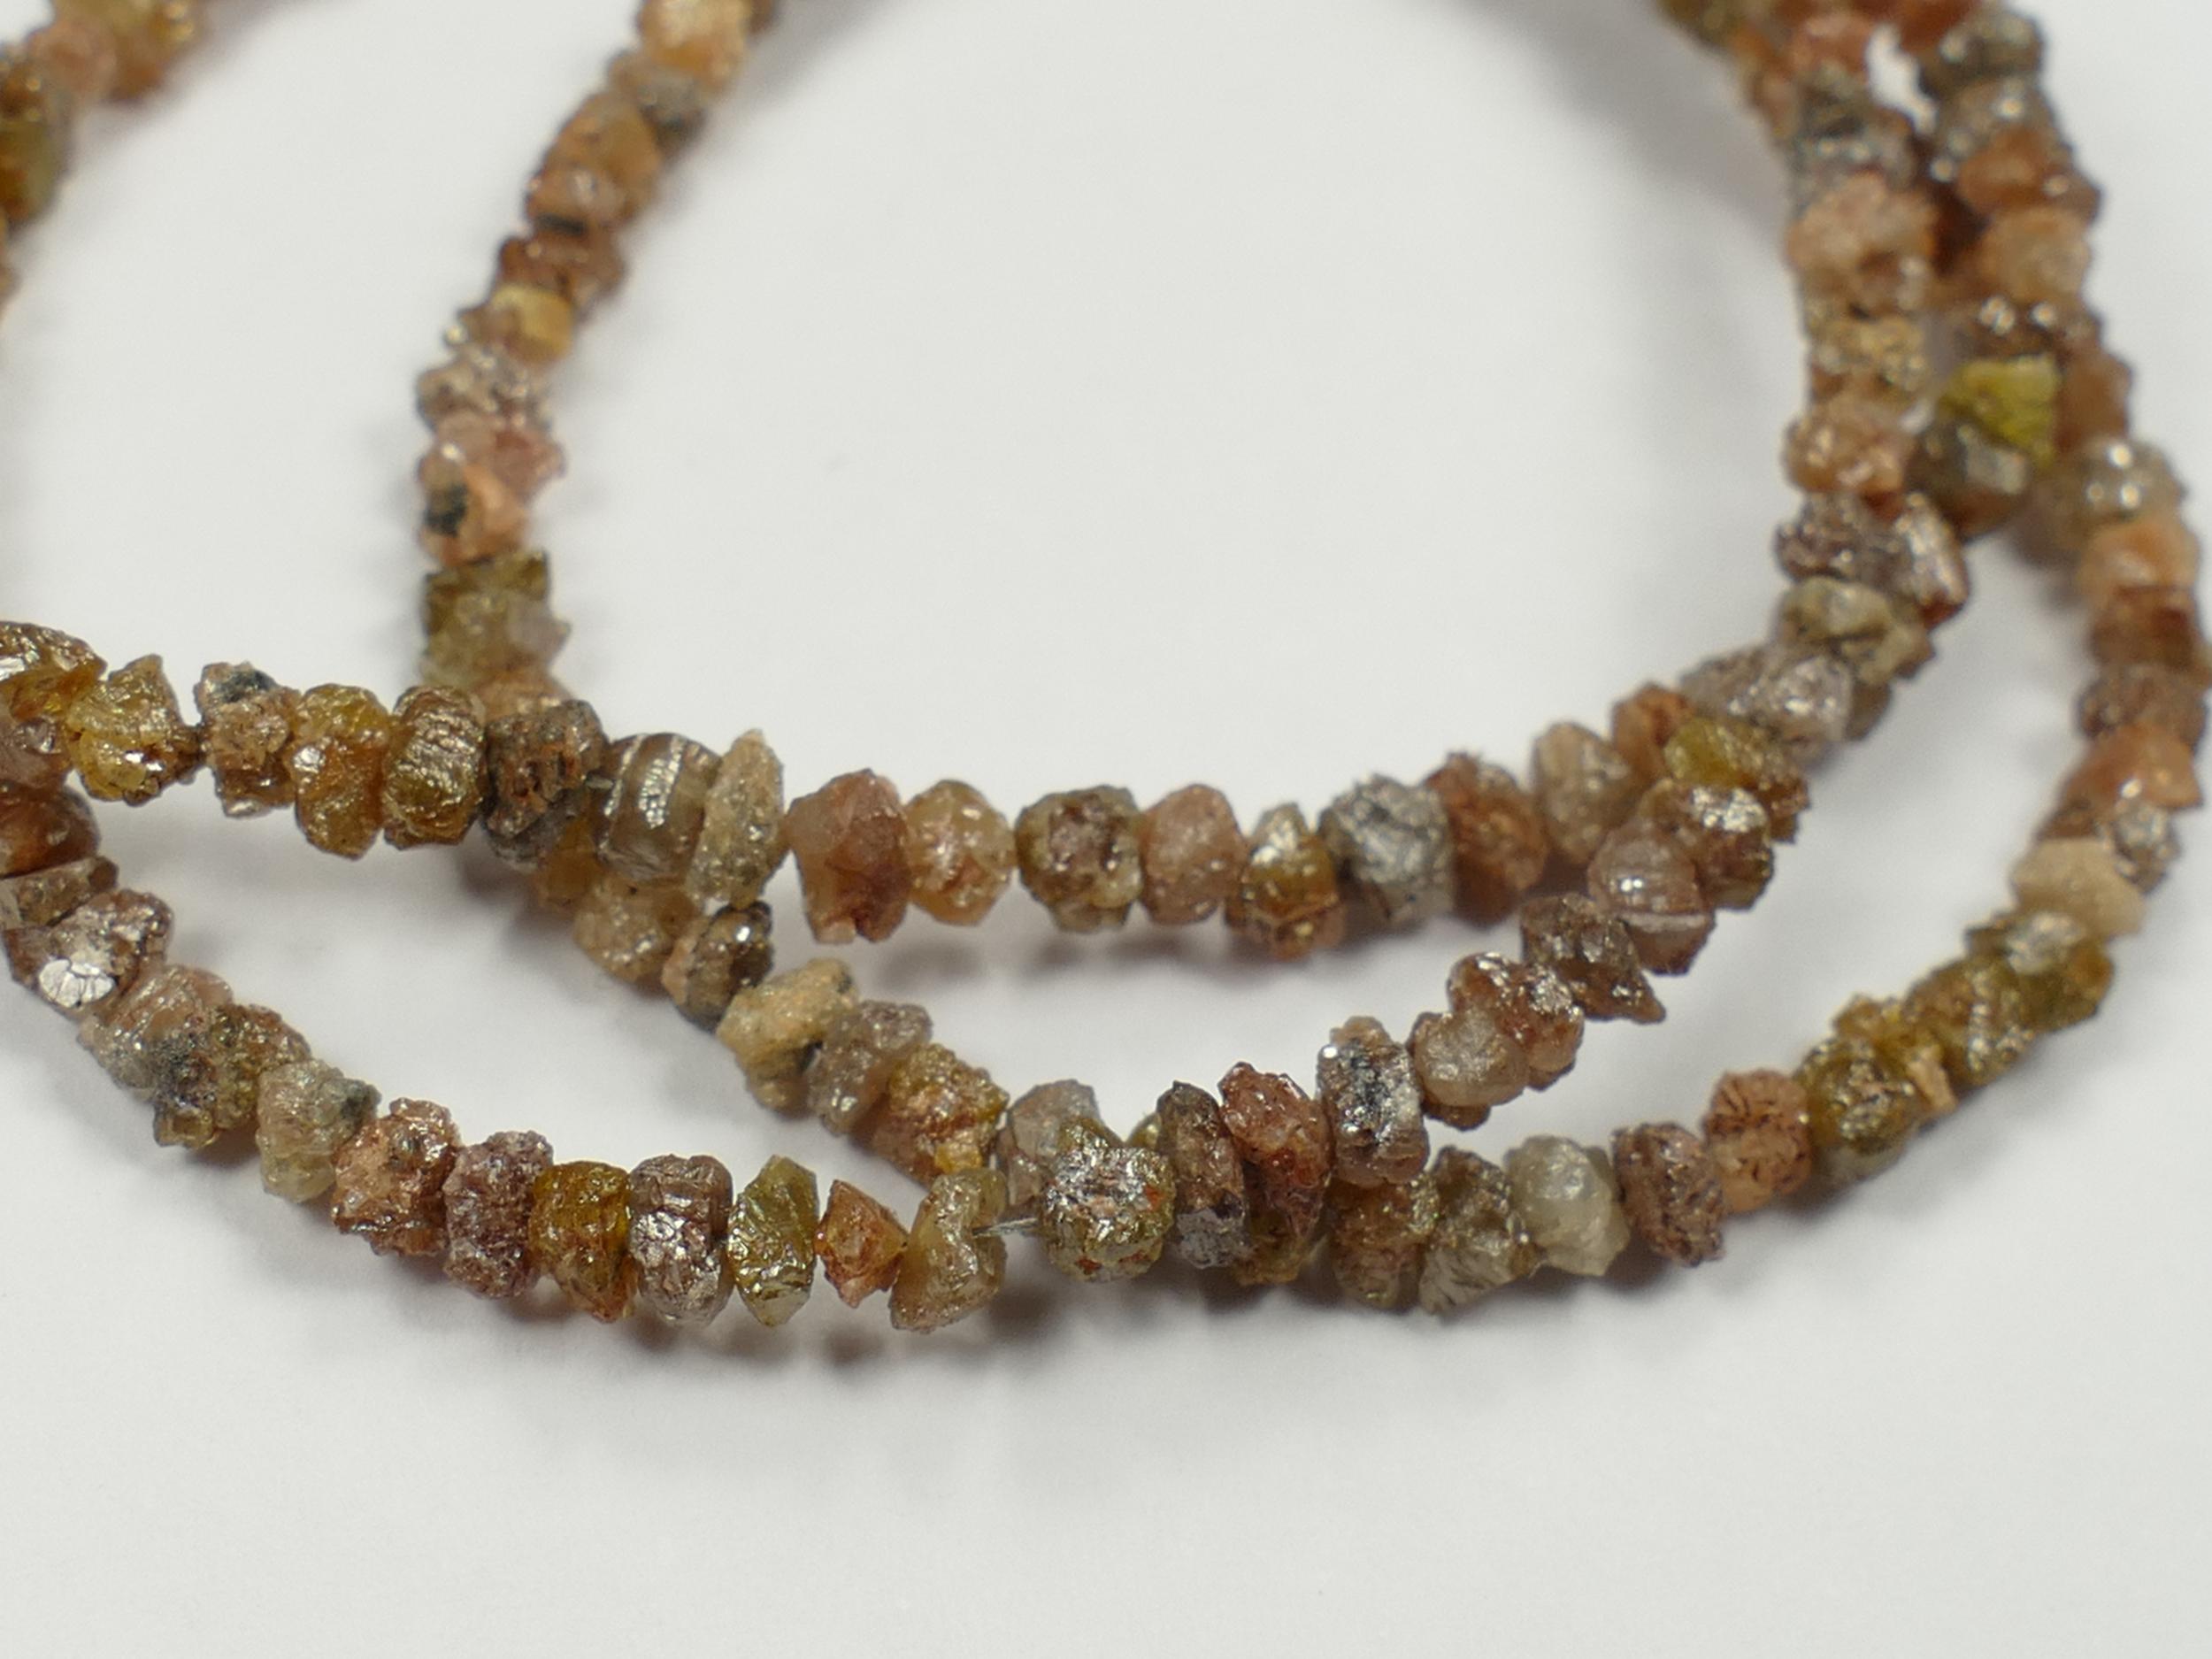 2.6/3.5mm Perles de Diamant rouge brun gris naturel brut percée x3cm (1.2inch) (#AC398)